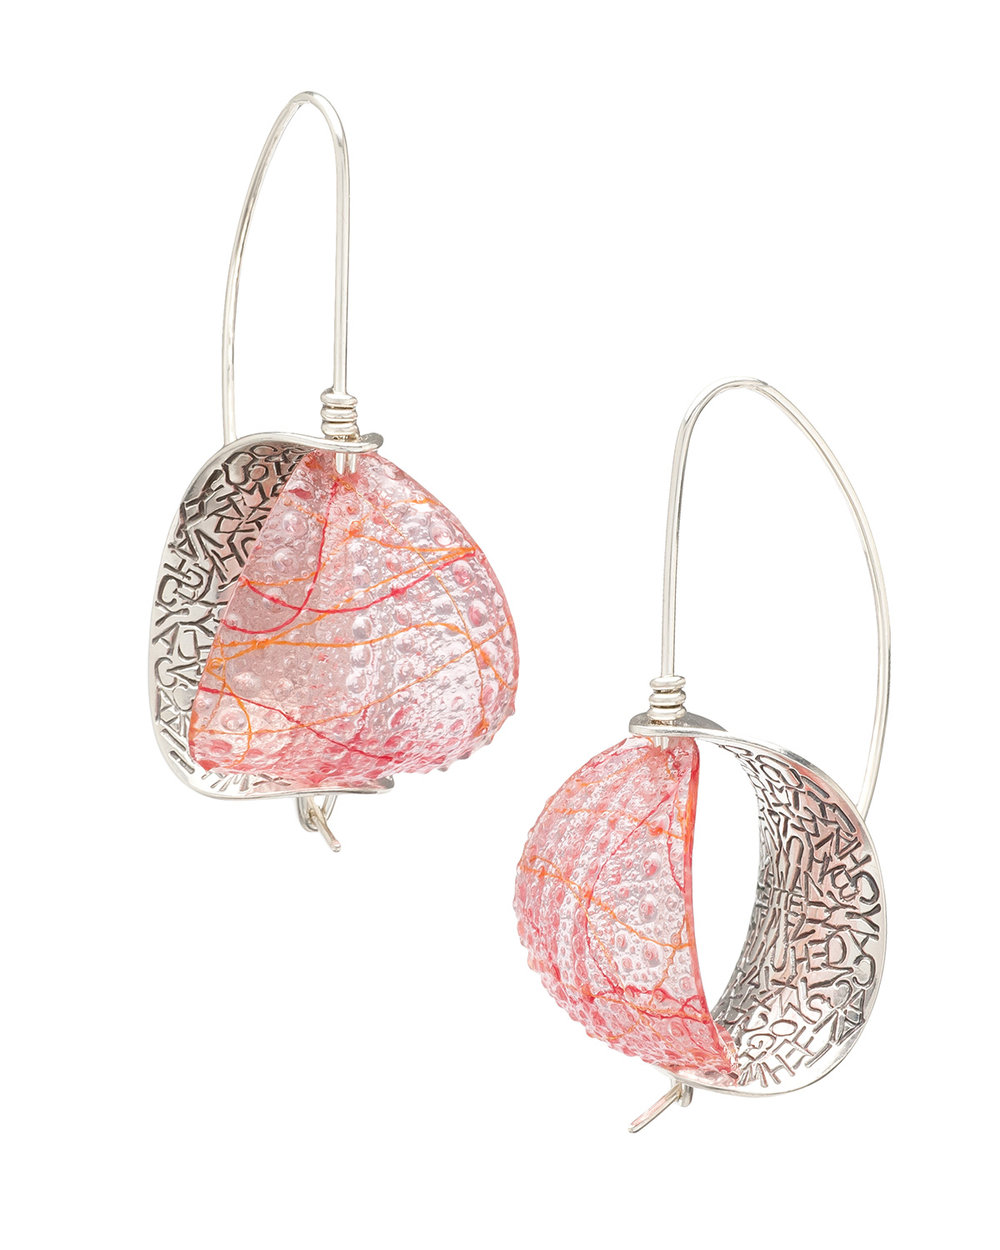 2016-09-Mary-Lynn-Podiluk-Retroflex-Earrings-31a.jpg